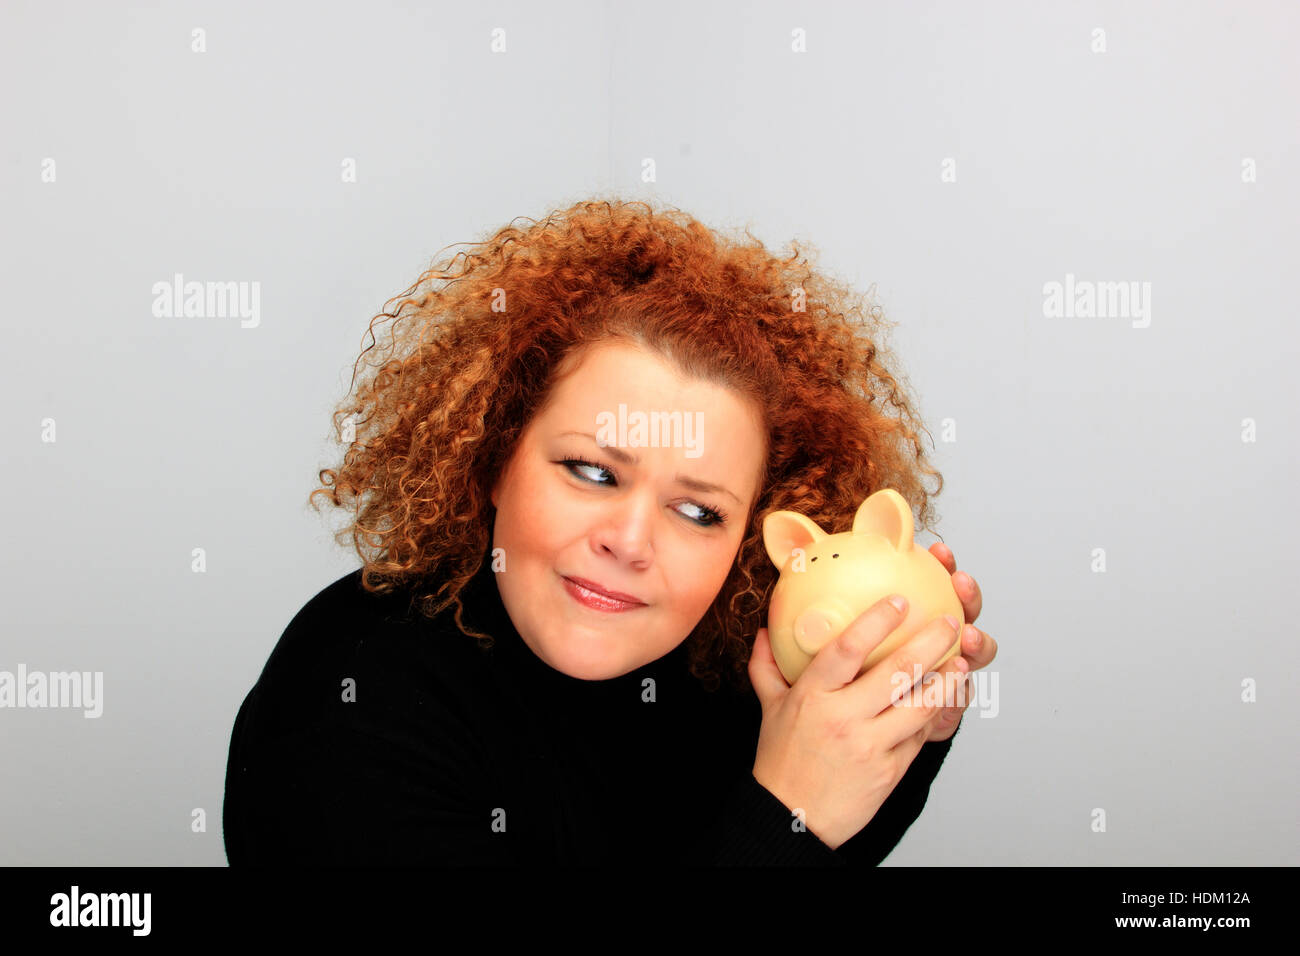 girl holding a piggy bank portrait Stock Photo